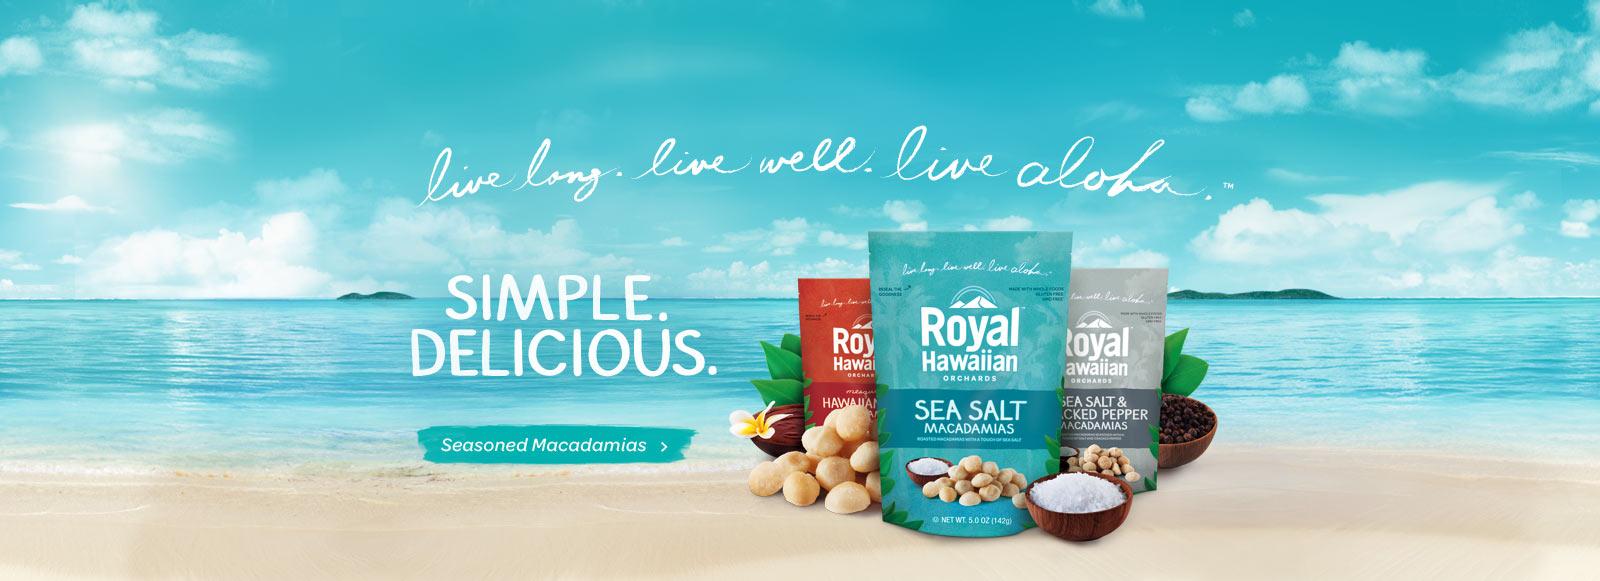 Seasoned Macadamia Nuts